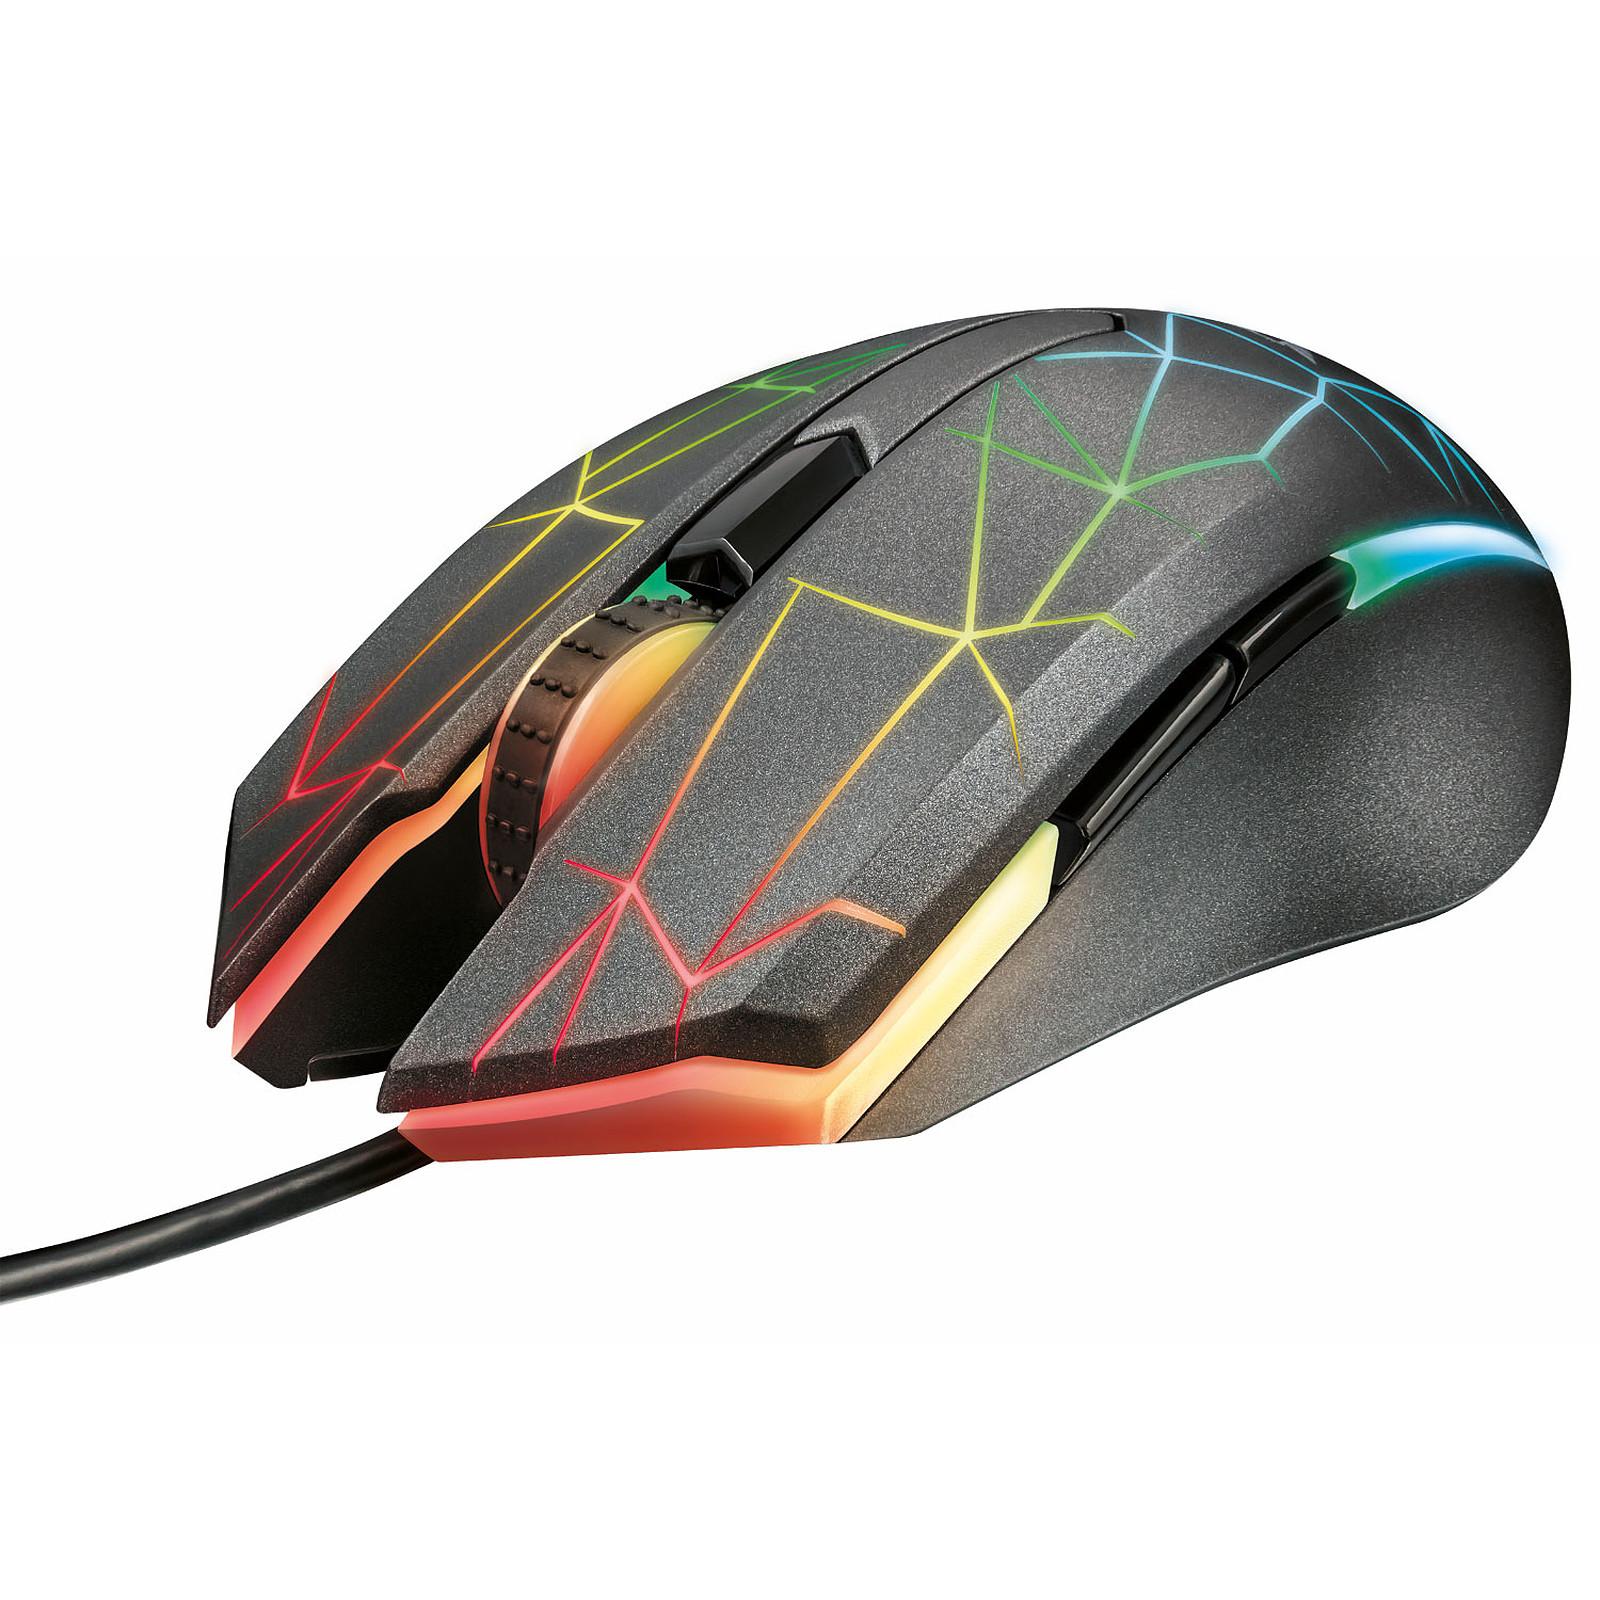 Trust Gaming GXT 170 Heron